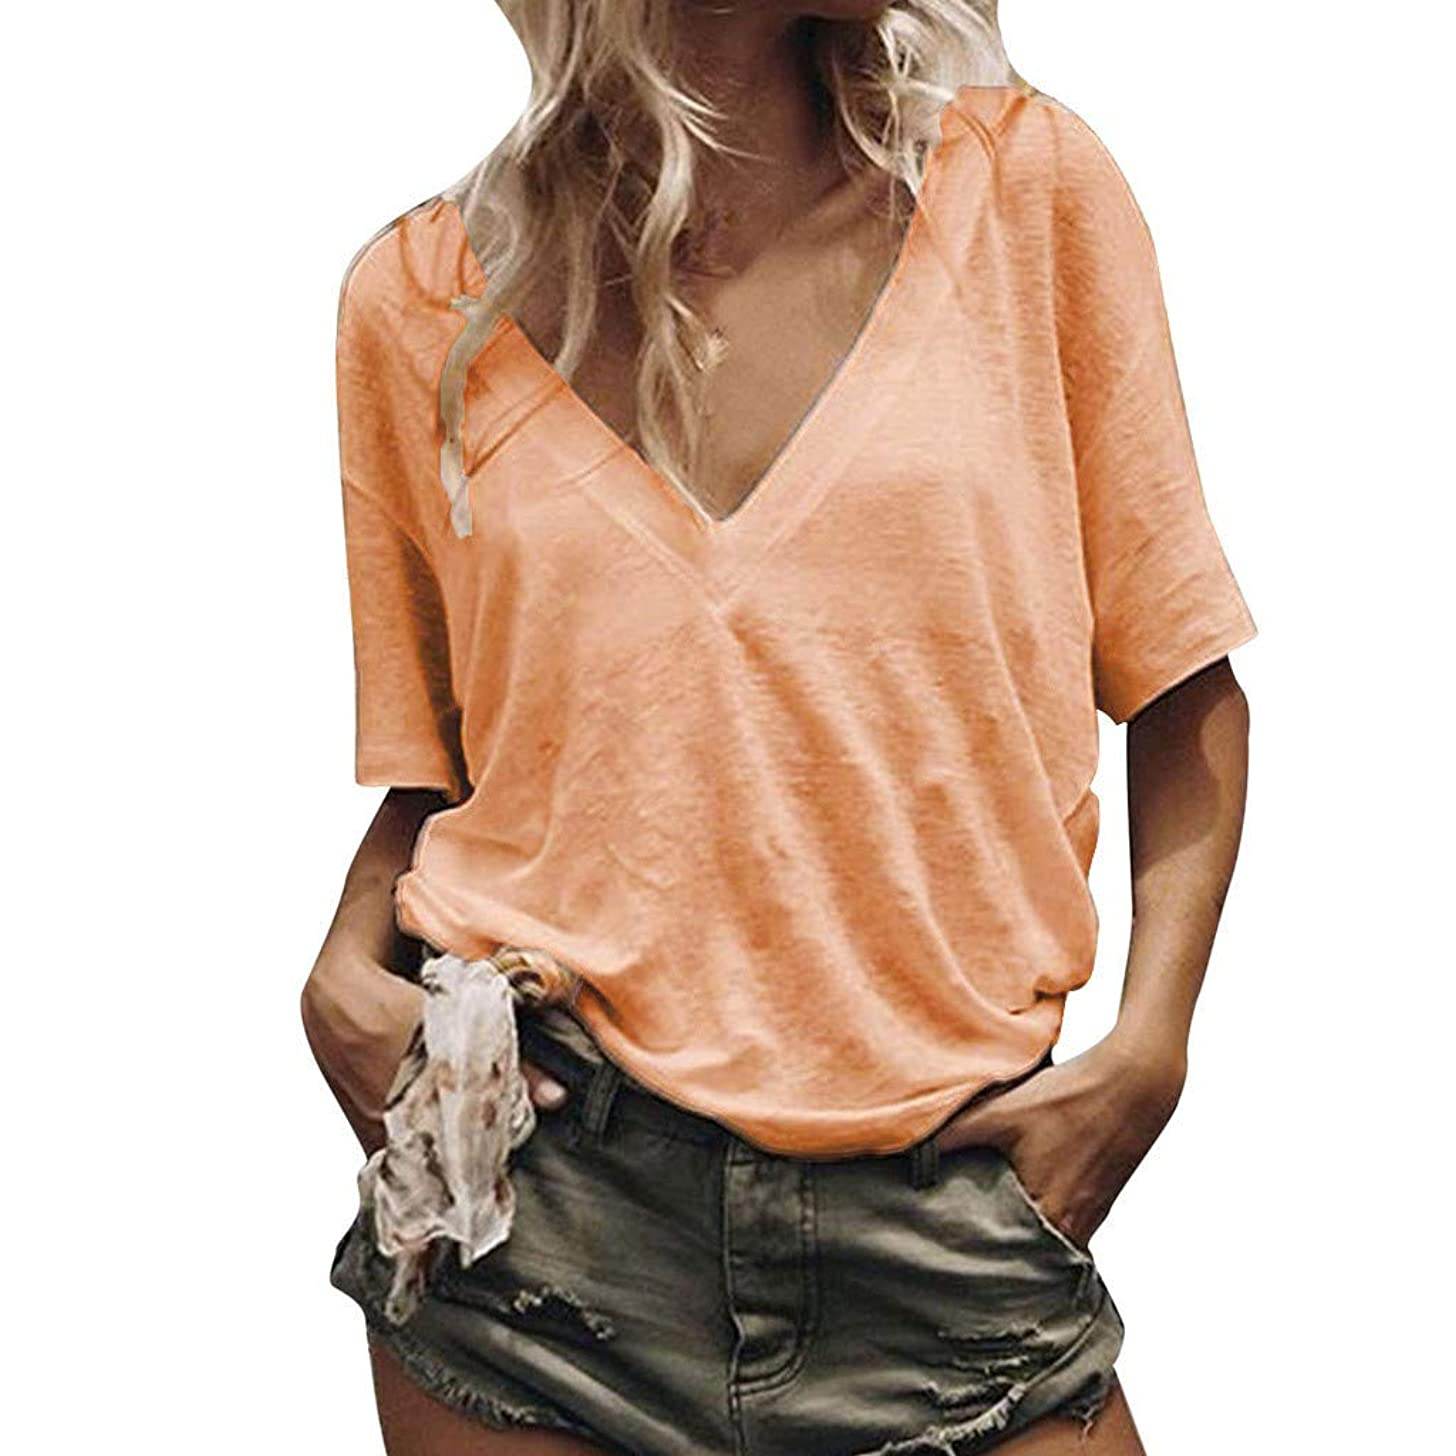 Nuewofally Women's V Neck T Shirt High Low Side Split Tunic Tops Summer Short Sleeve Loose Casual Tee T-Shirt (Orange,2XL)